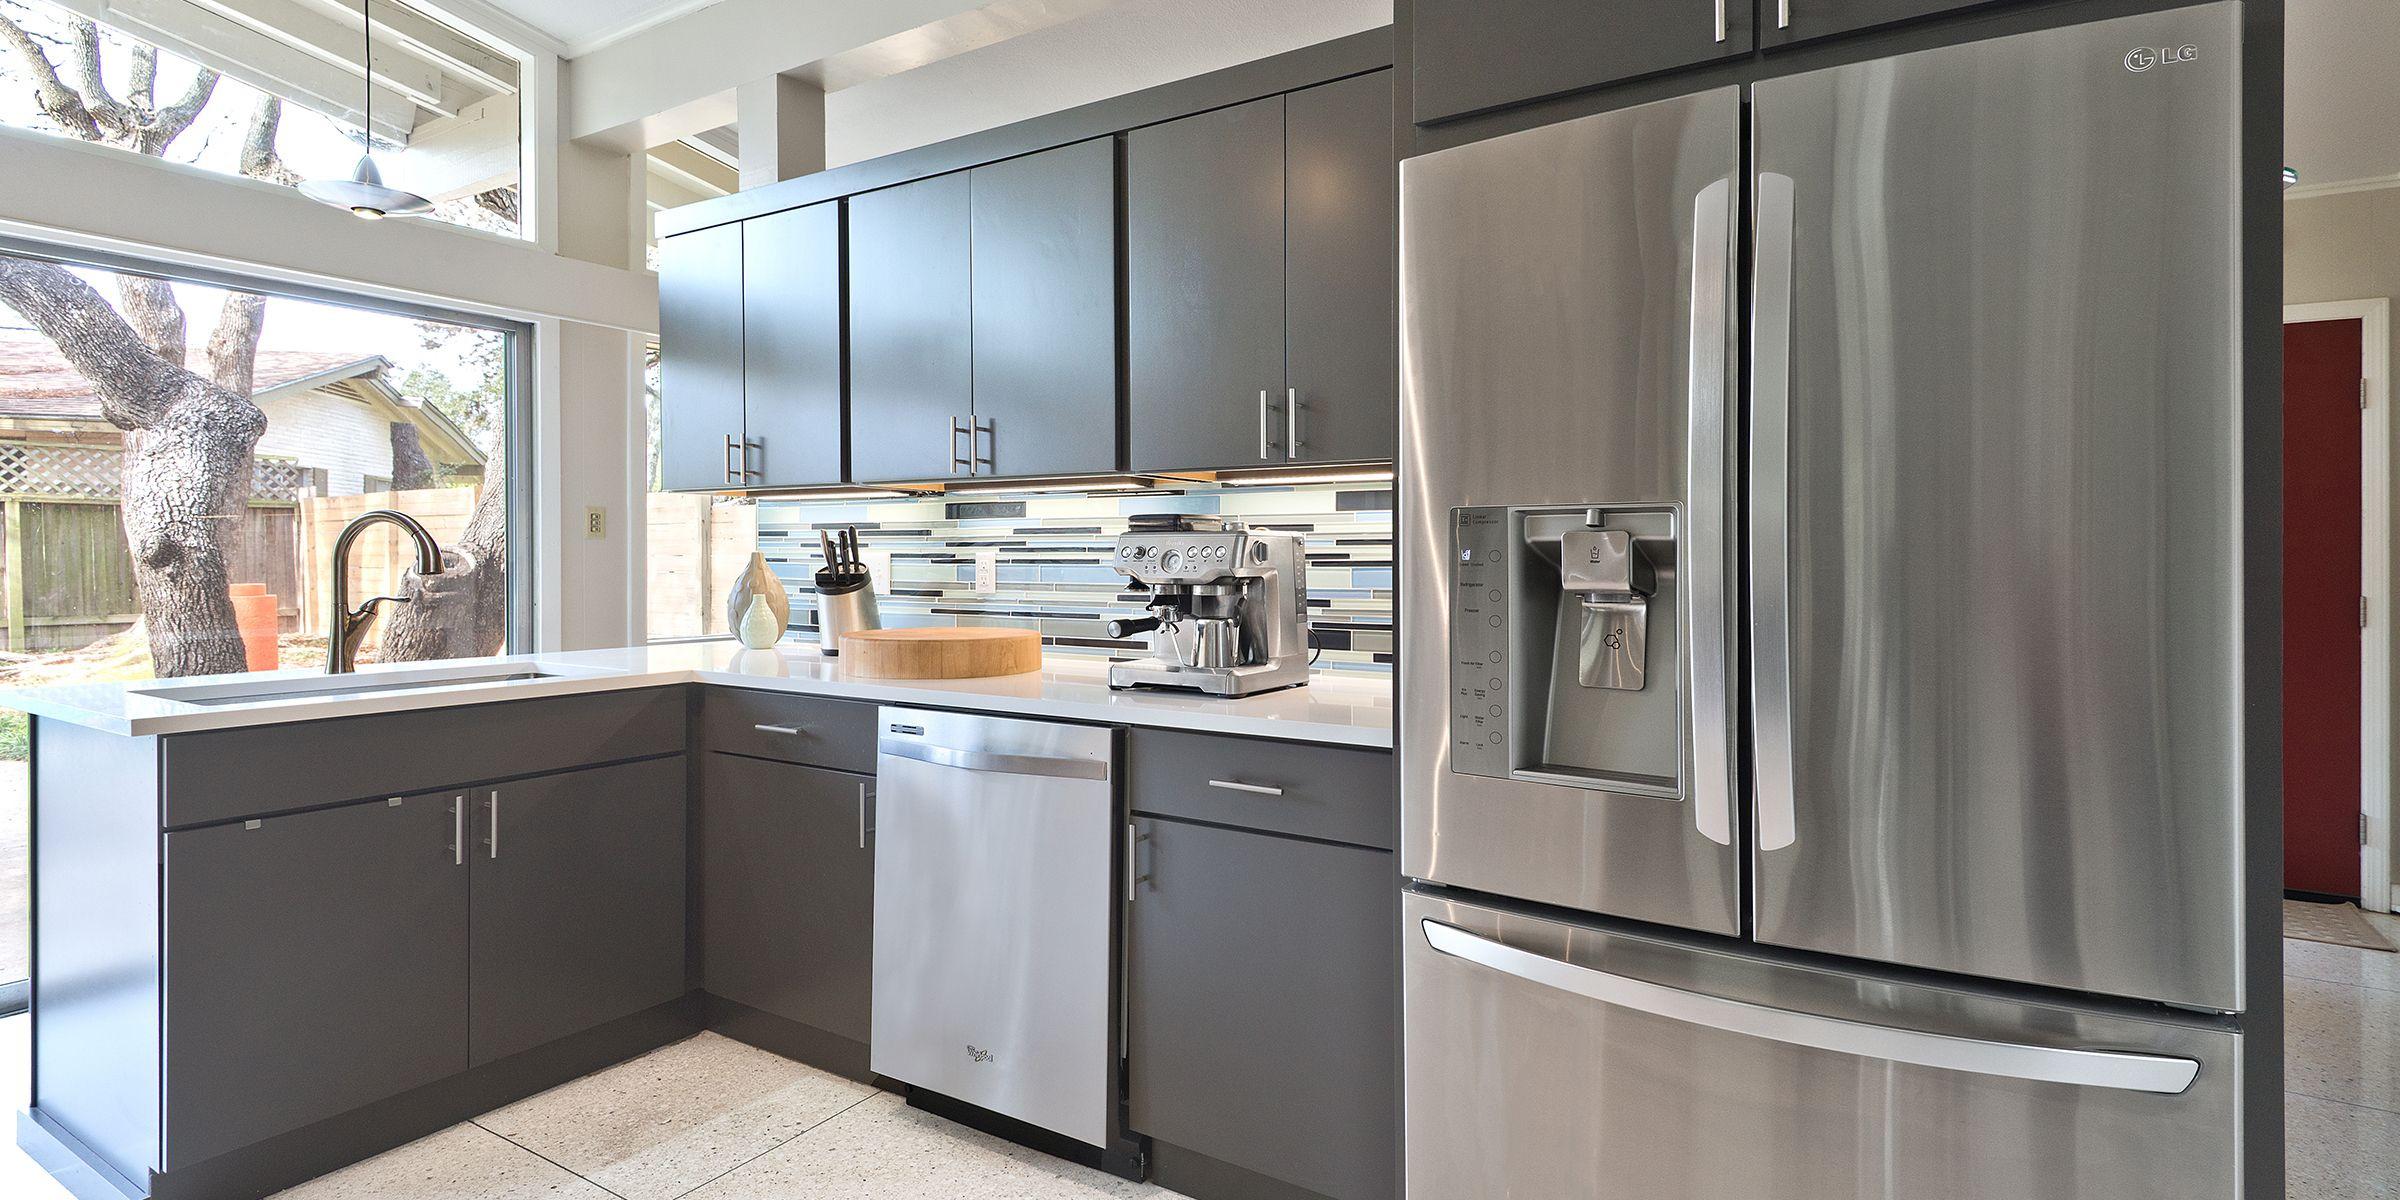 Kitchen Remodelers San Antonio  Remodeled kitchen in San Antonio TX Forest Oaks Mid